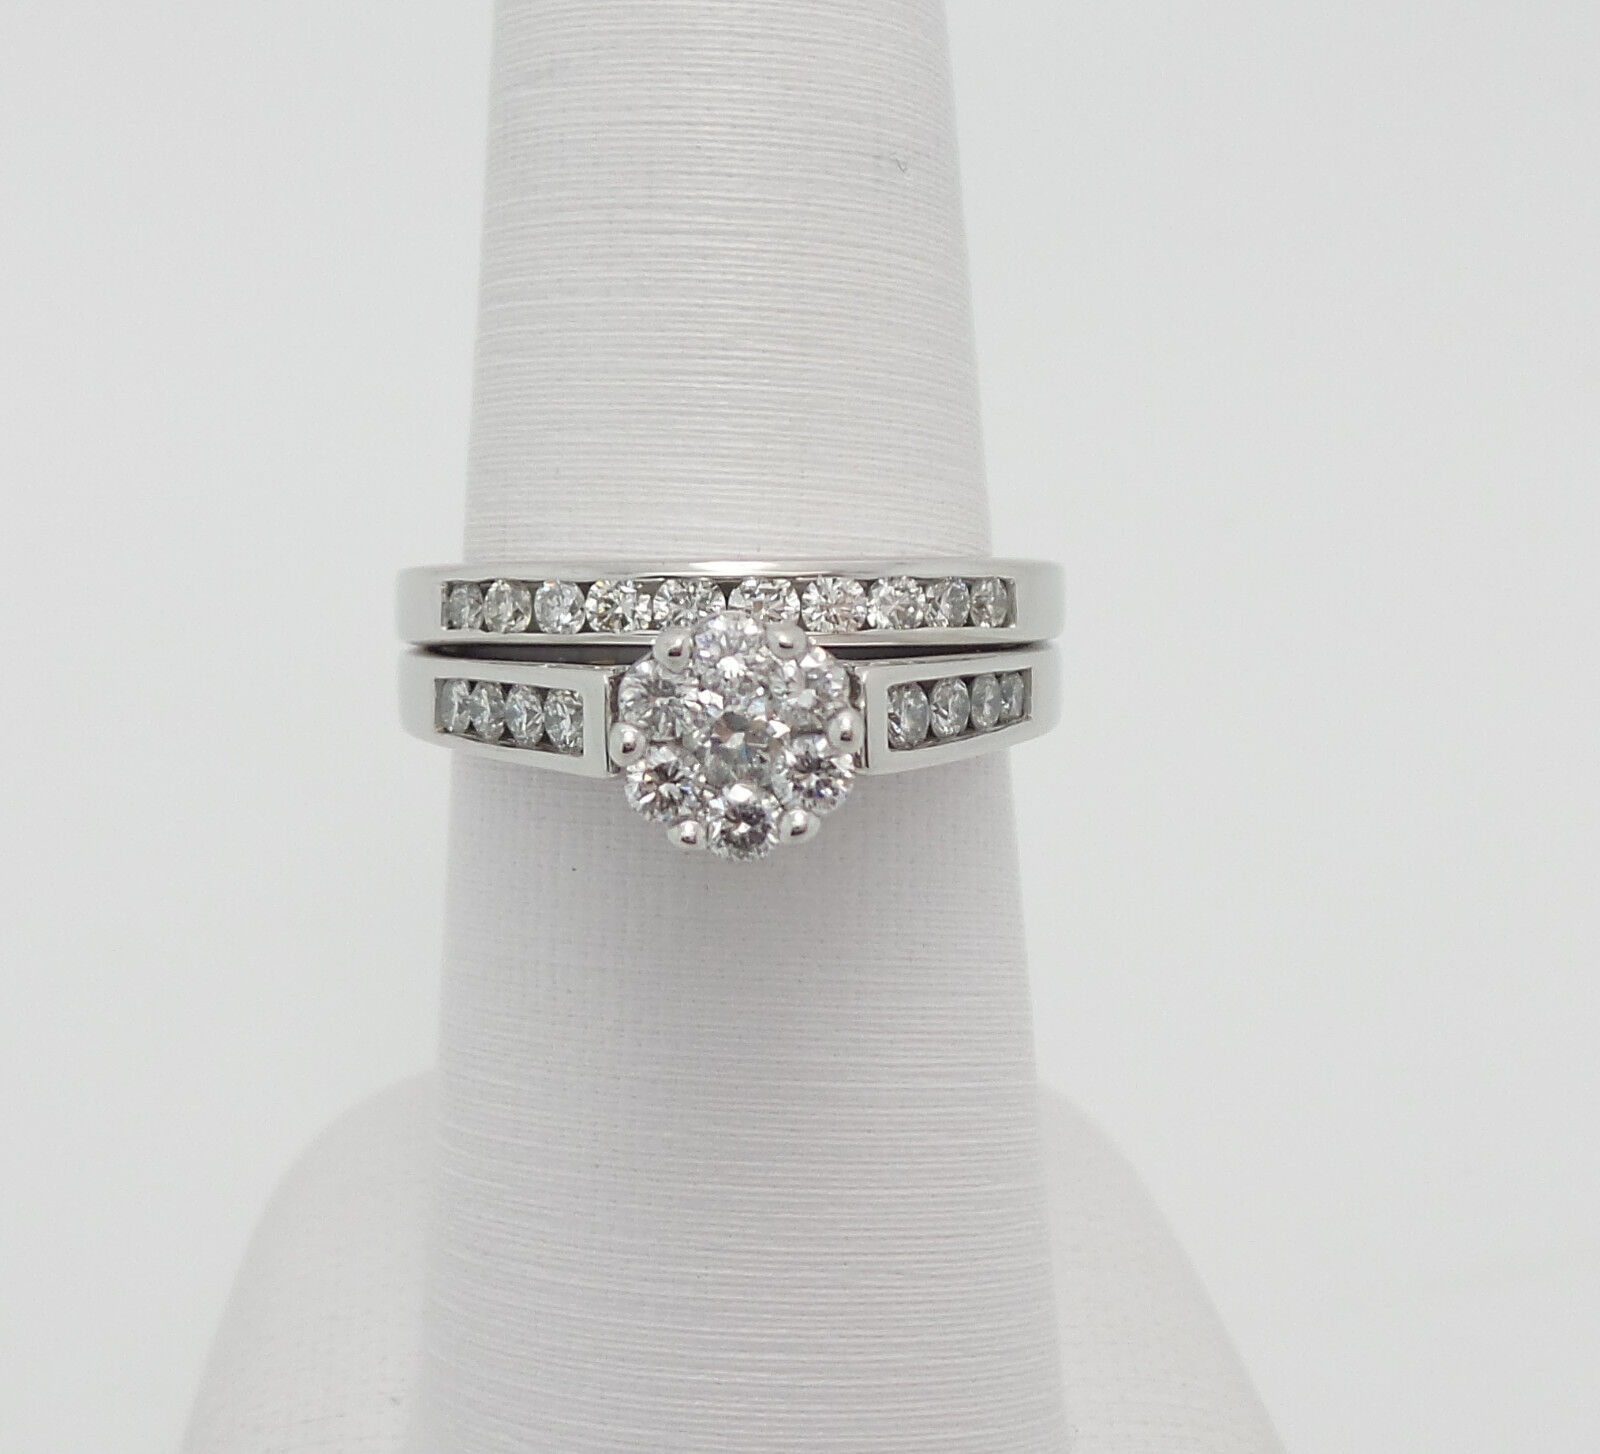 Zales 1CT Diamond Bridal Set Engagement Wedding Ring Set 14K White Gold